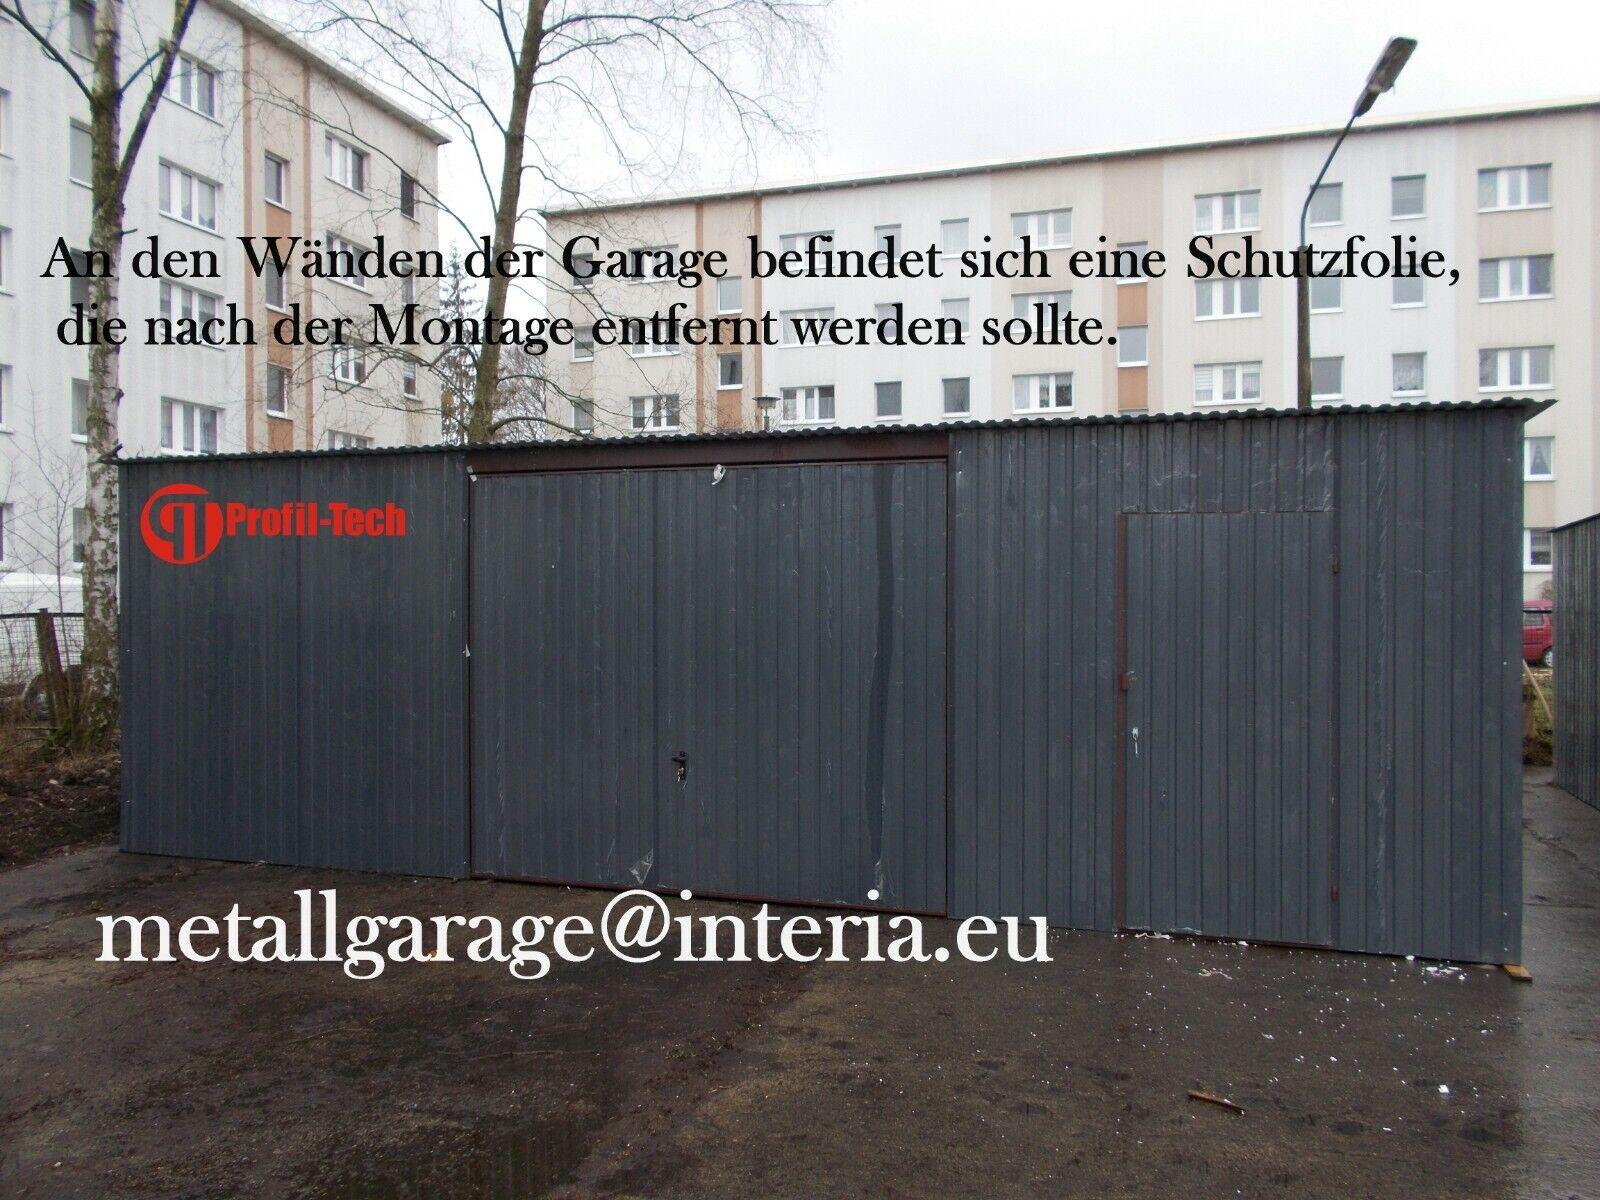 8x6 Blechgarage Fertiggarage Metallgarage RAUM KFZ REIFEN LAGER GARAGE